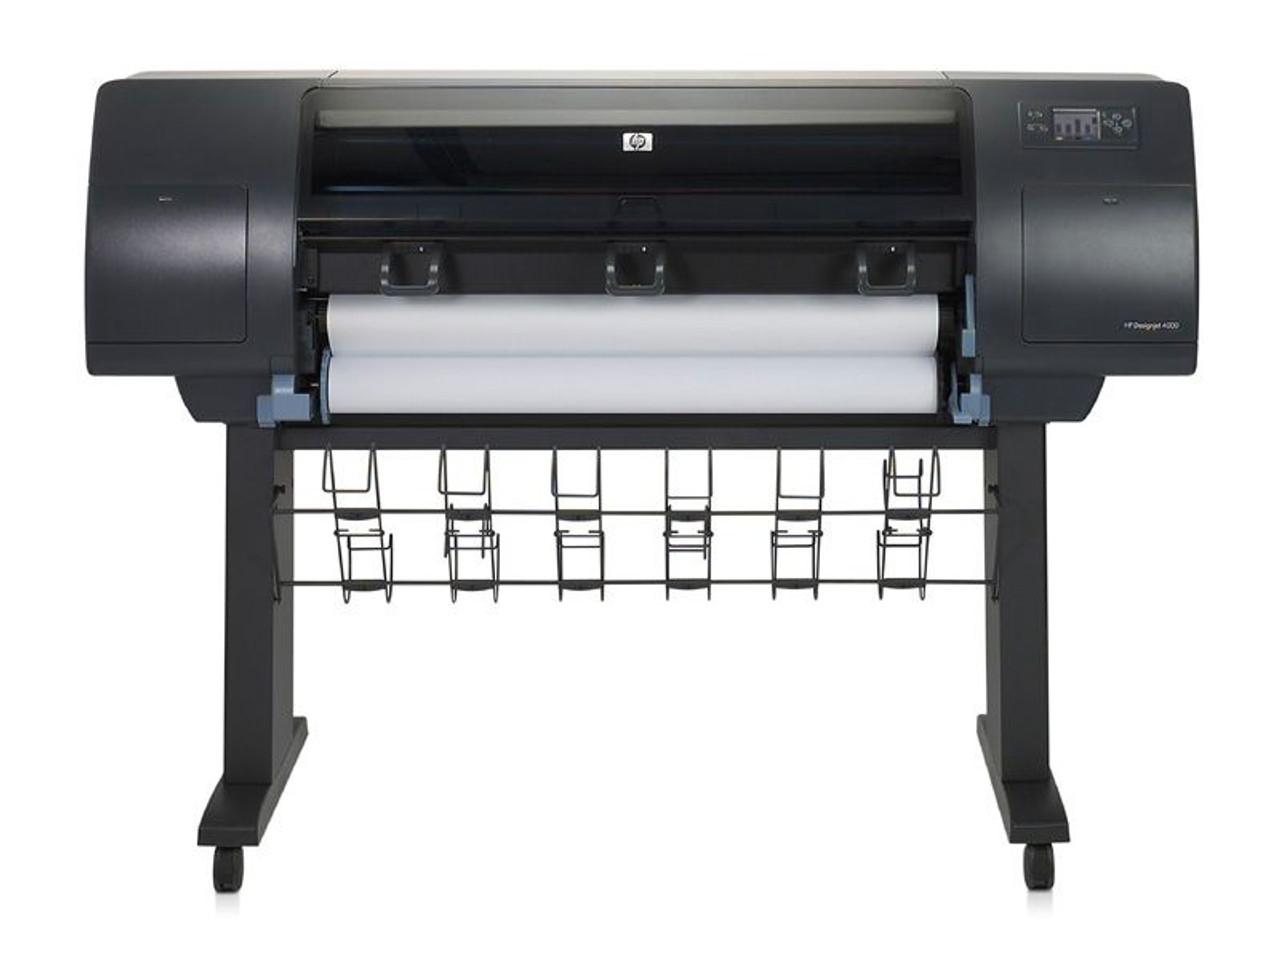 hp designjet 4000ps q1274a hp plotter for sale rh printerstop com hp designjet 4000 service manual.pdf hp designjet 4000 specifications